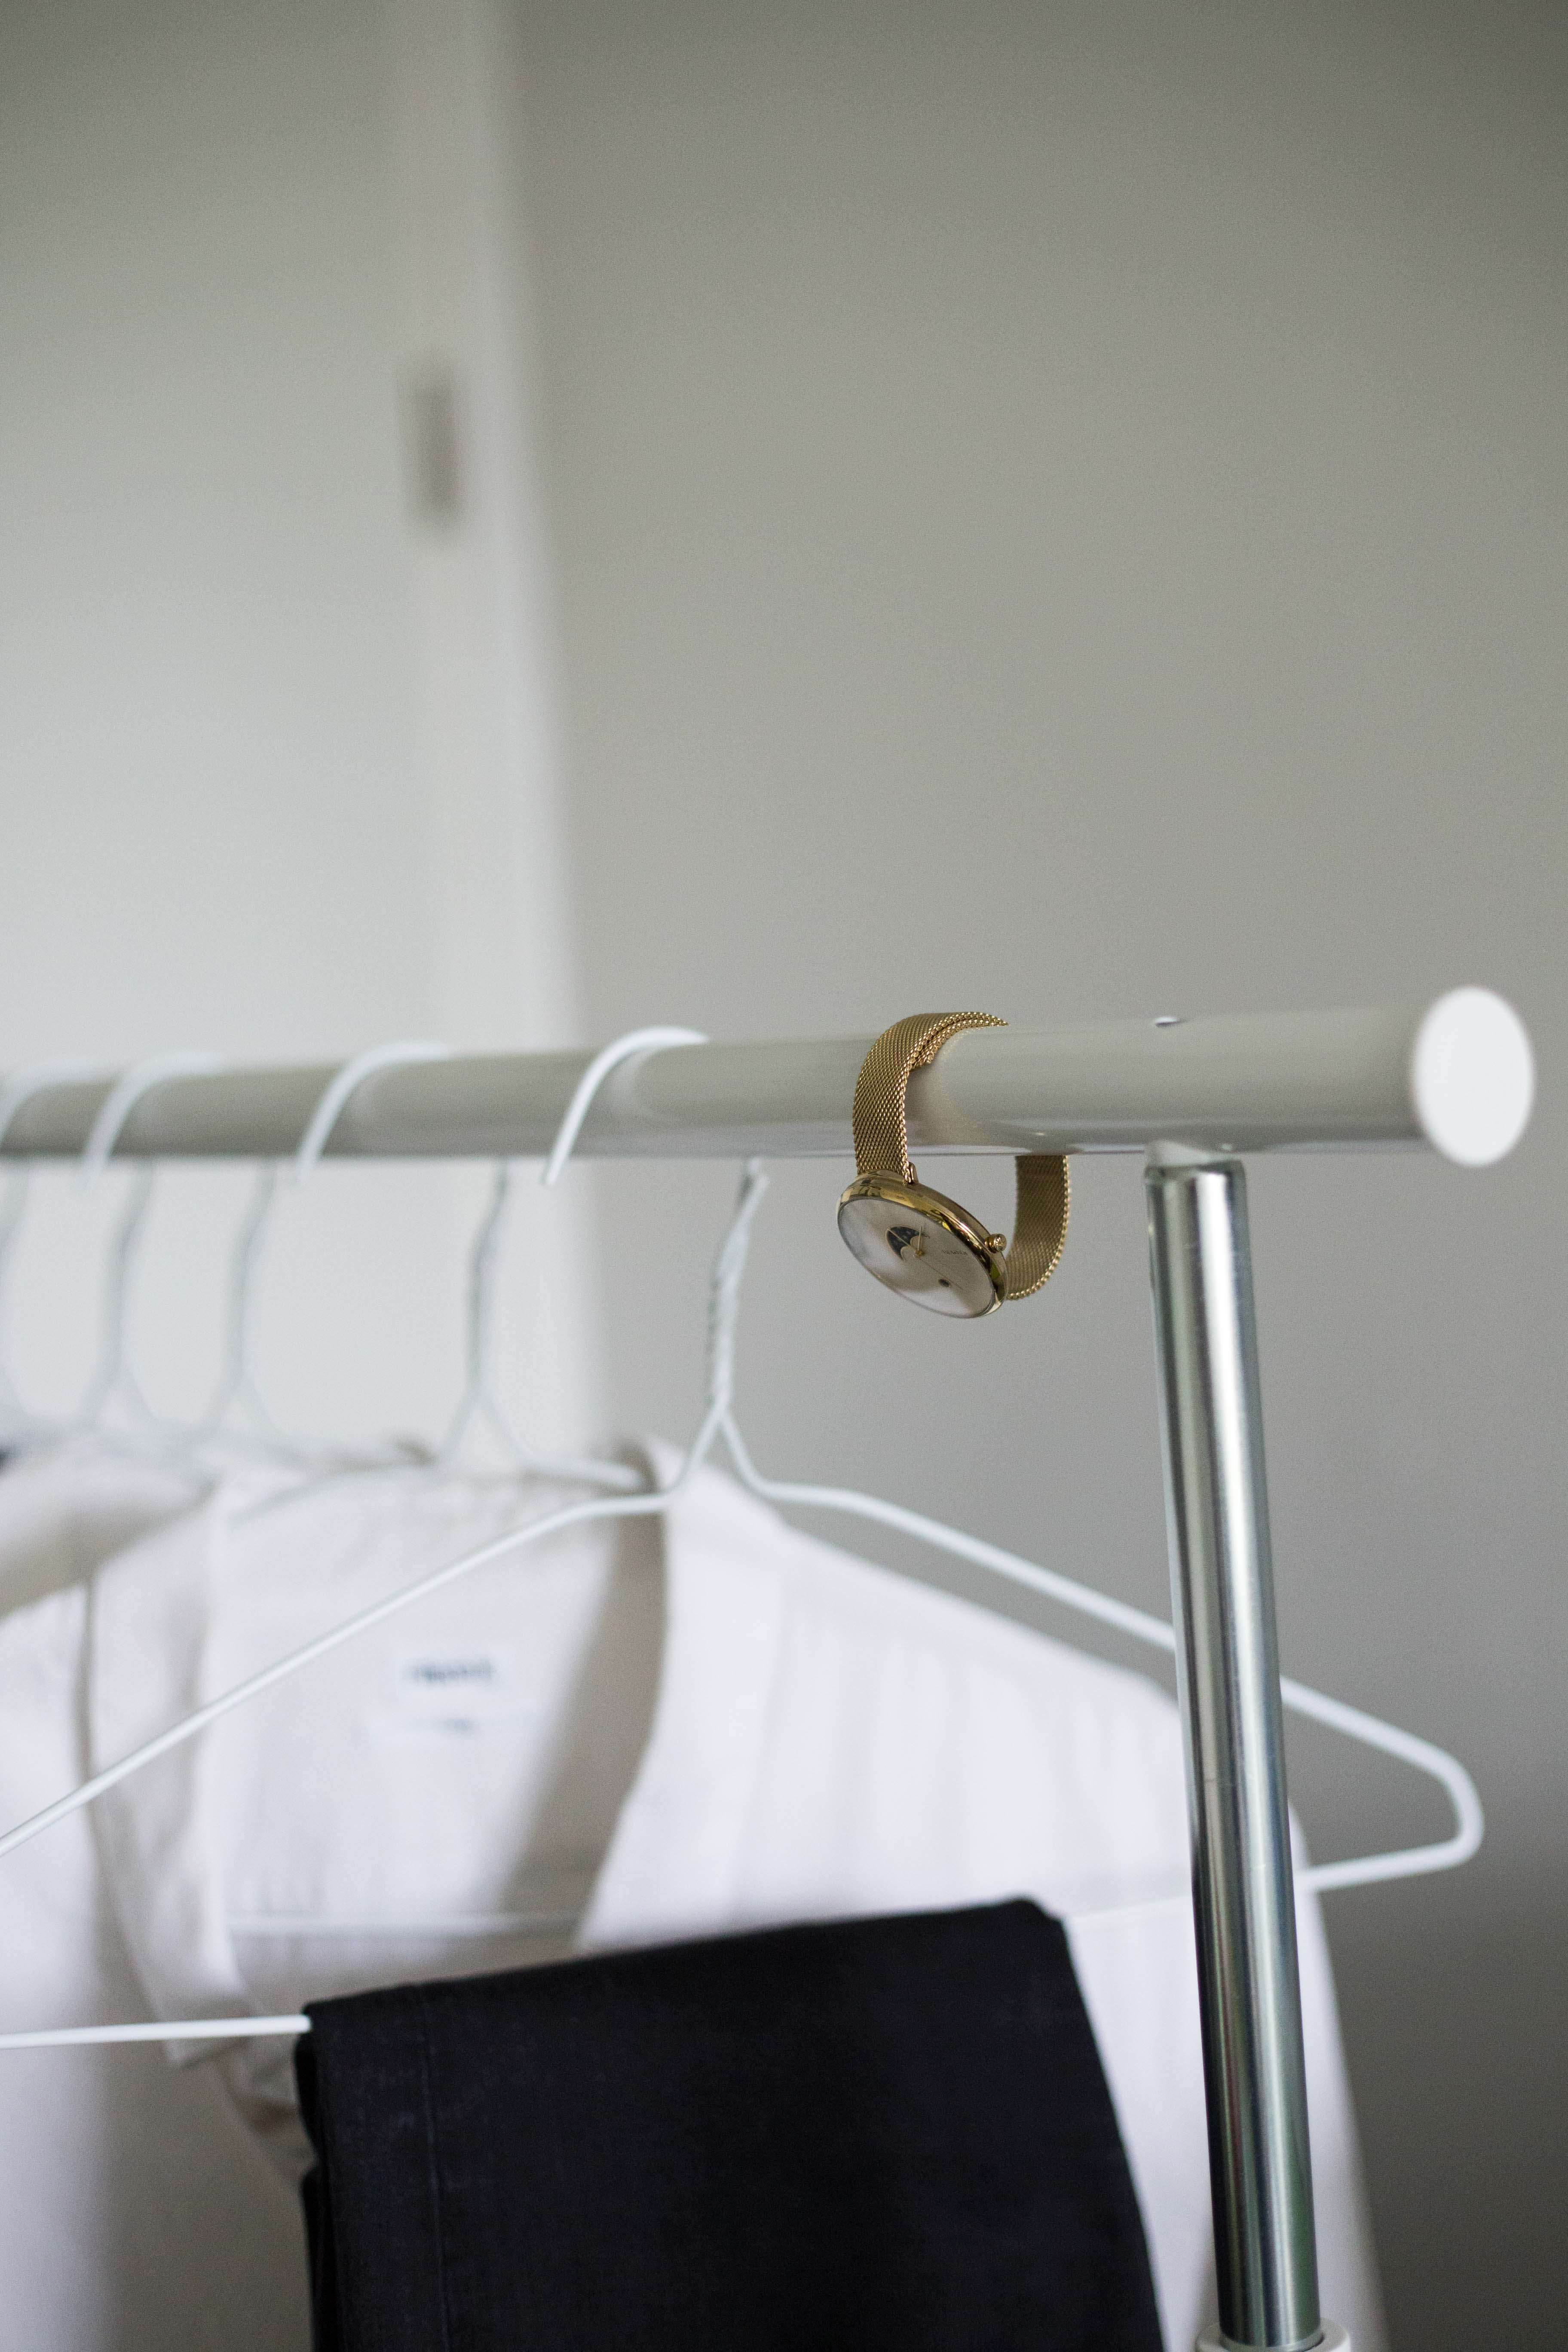 Minimalismus, Capsule Wardrobe, Kleiderschrank-Experiment, #juni15x30, Minimalist Garderobe